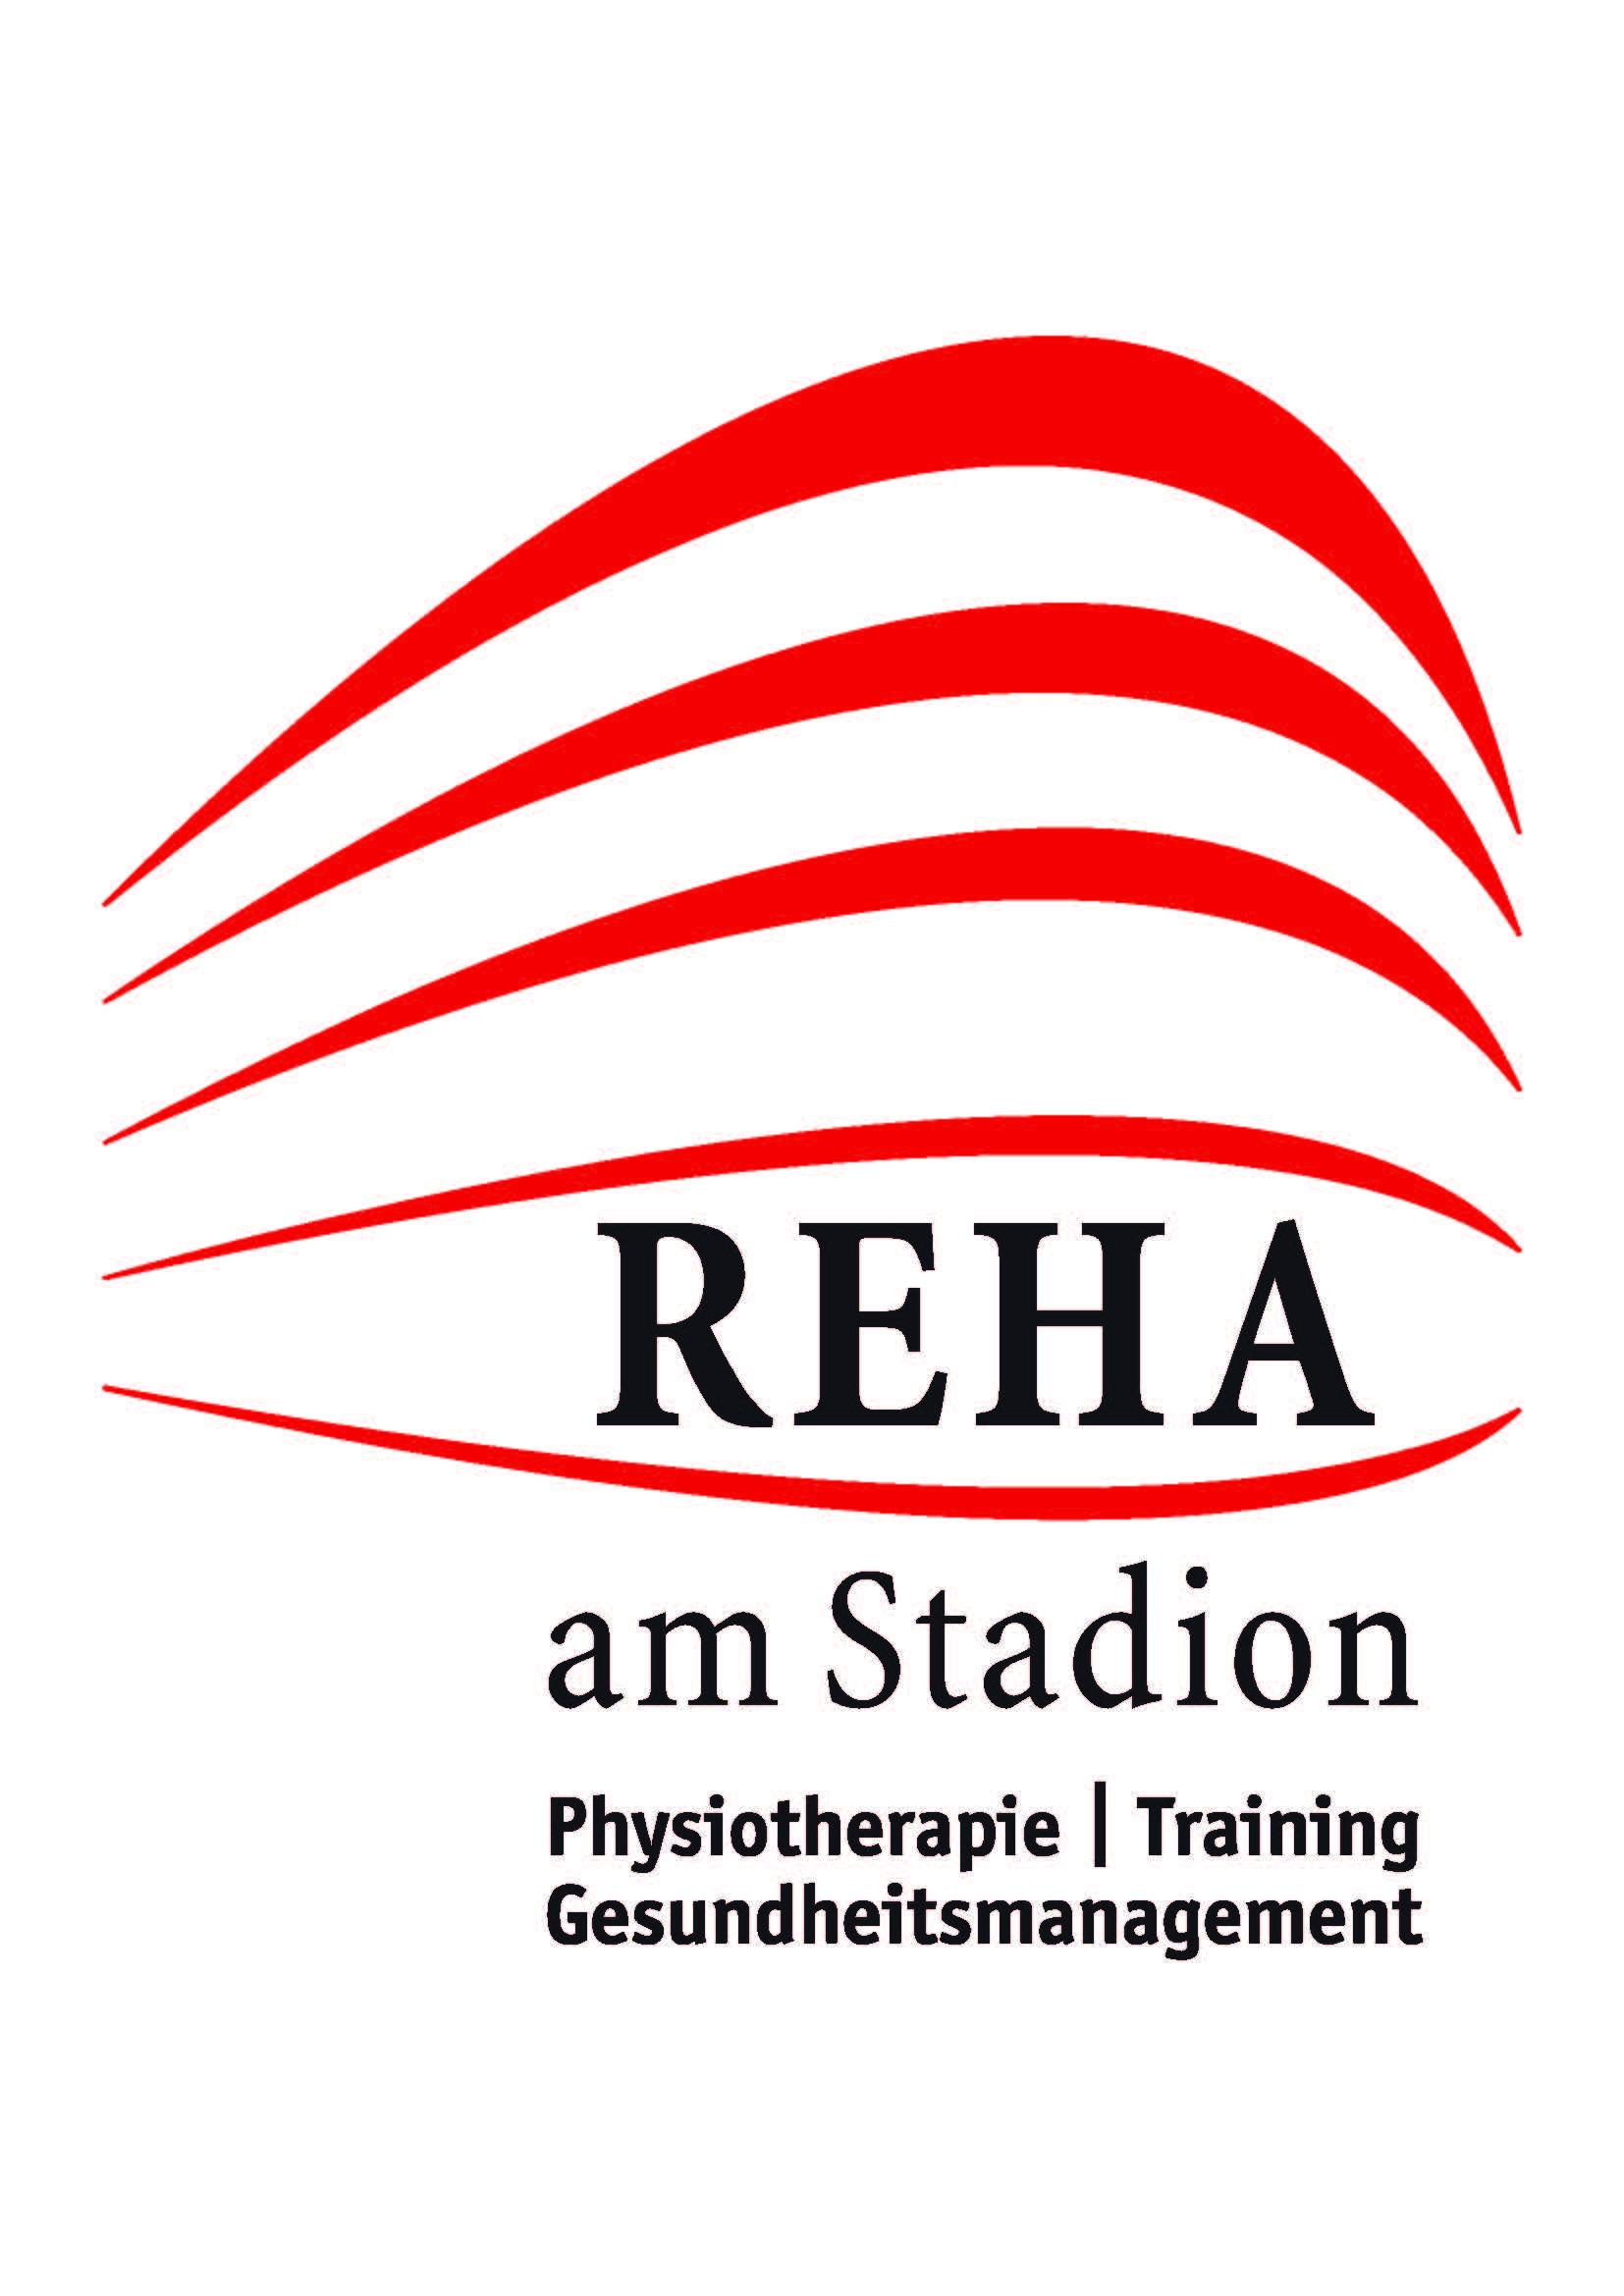 REHA am Stadion Logo